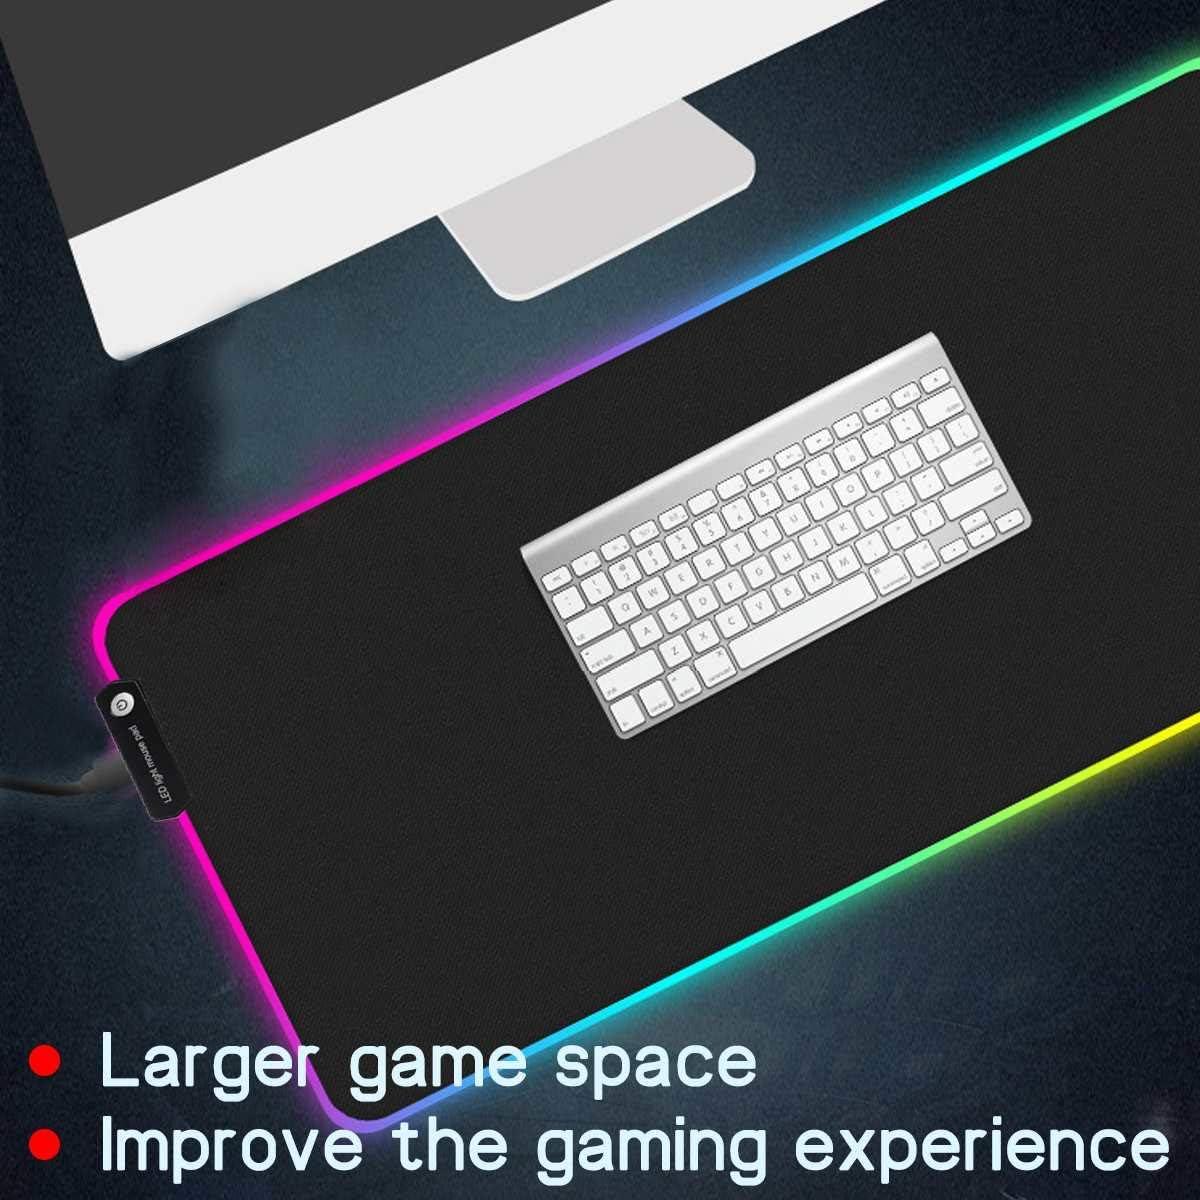 DELAMZ Large RGB LED Gaming Mouse Pad Gamer Mousepad LED Lighting Illuminated Colorful USB Luminous Non-Slip Mouse Mice Mat